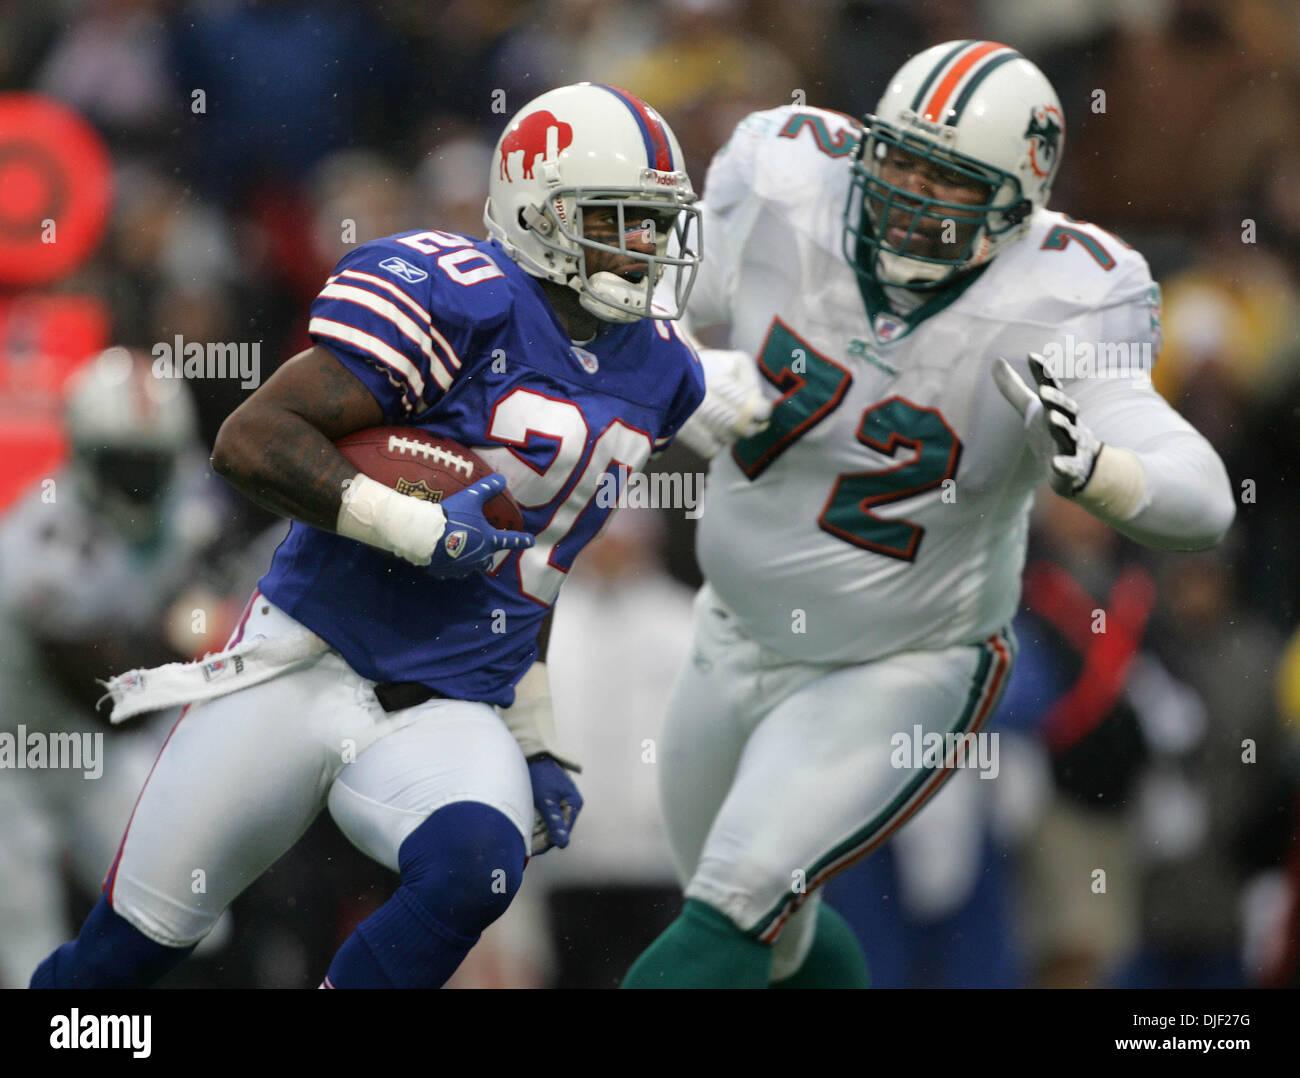 Dec 09, 2007 - Buffalo, New York, USA - Bills #20 DONTE WHITNER returns an interception of a Leo Lemon pass as Dolphins Stock Photo